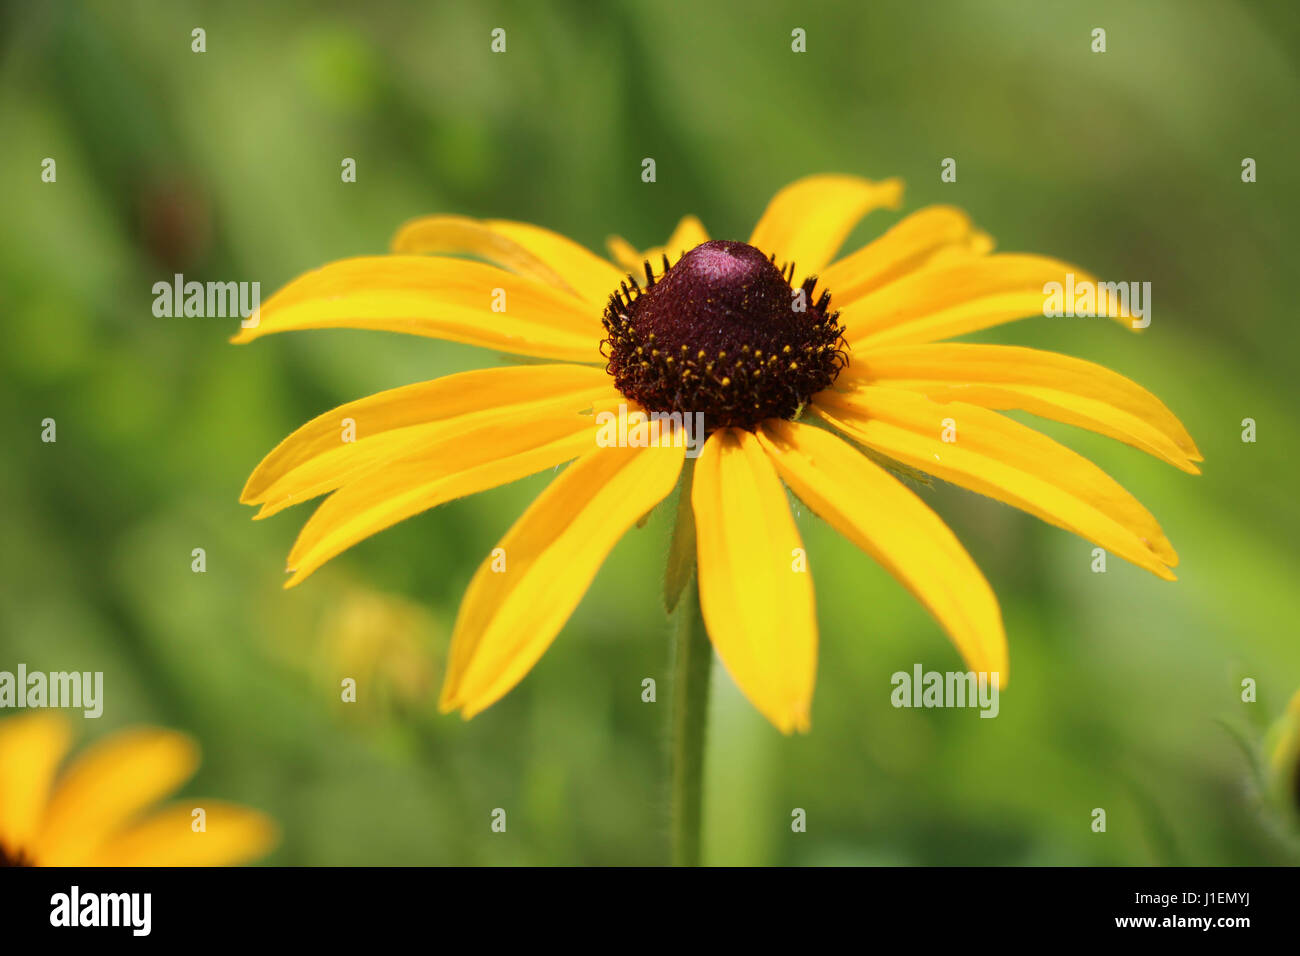 Yellow Coneflower Closeup Stock Photo 138621382 Alamy